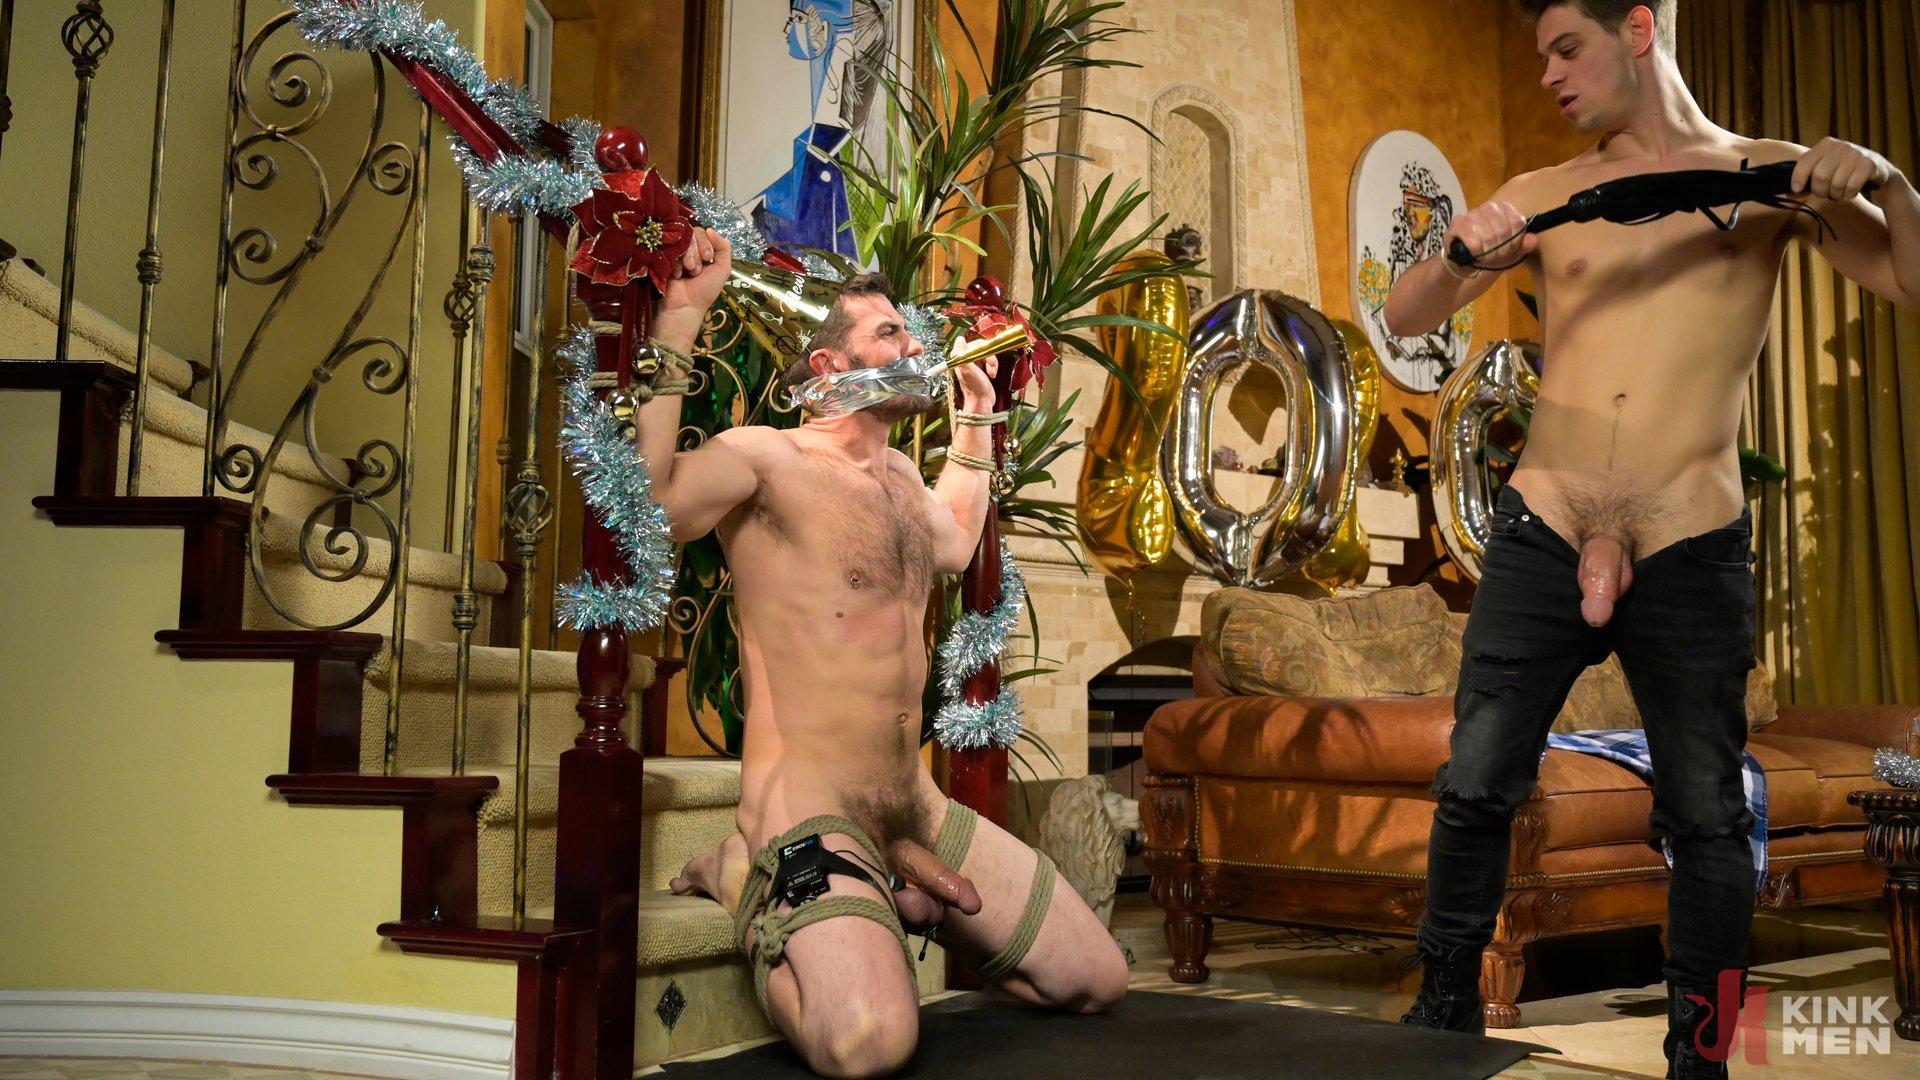 Photo number 10 from Homo Alone Part 2: Pizza Man Michael DelRay Punishes Vander Pulaski shot for Bound Gods on Kink.com. Featuring Michael DelRay and Vander Pulaski in hardcore BDSM & Fetish porn.